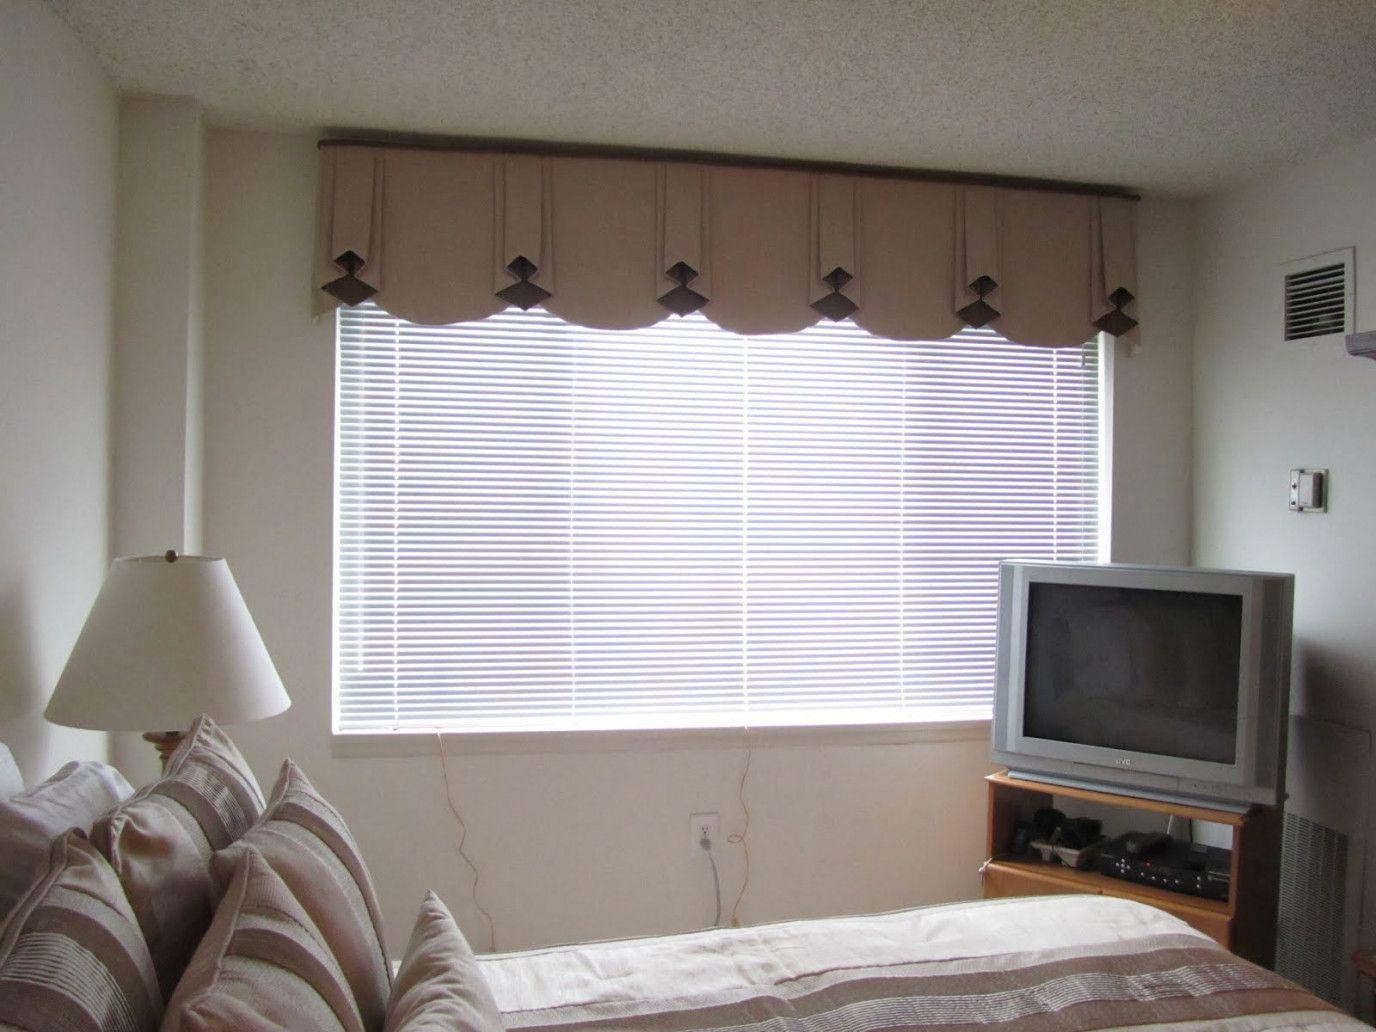 78 Bedroom Window Valance Ideas Interior Design Check More At Http